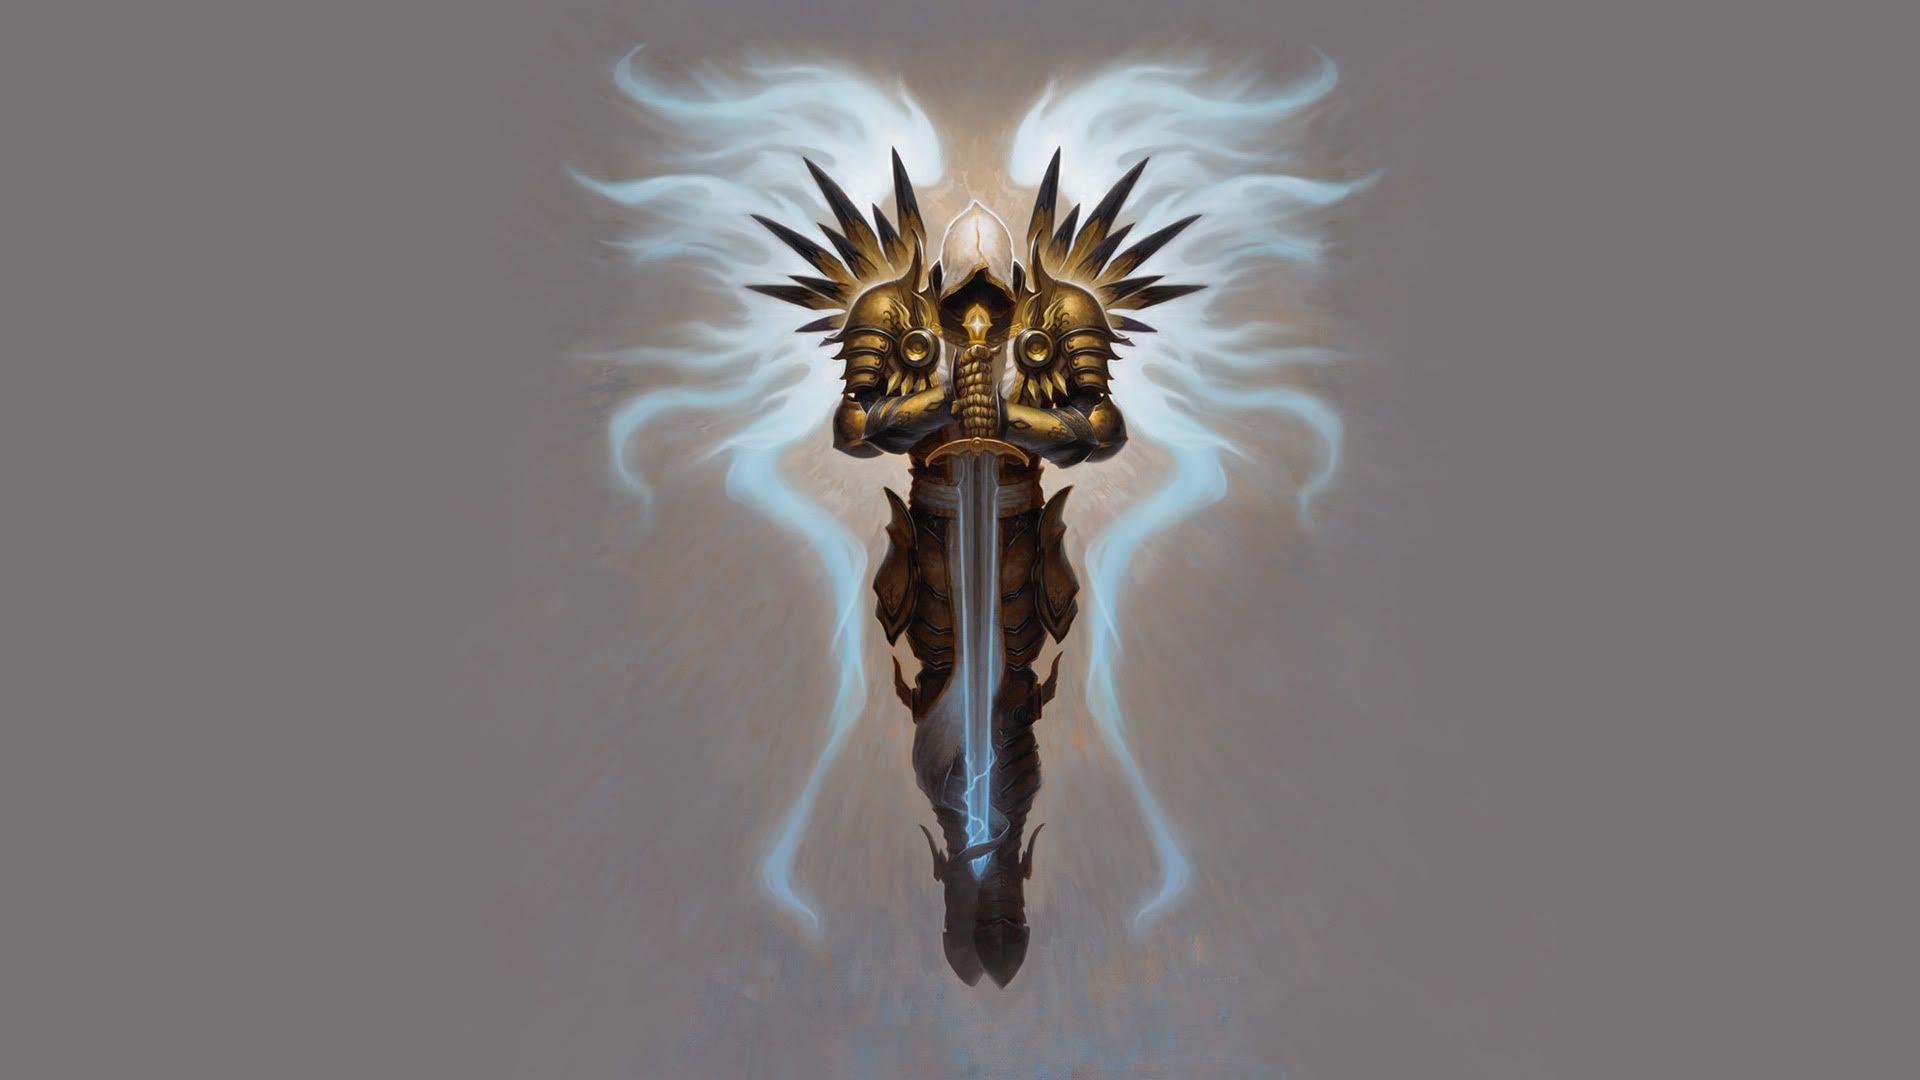 Res: 1920x1080, iPhone Video Game/Diablo III Wallpaper ID: 1024×768 Diablo 3 Tyrael  Wallpapers